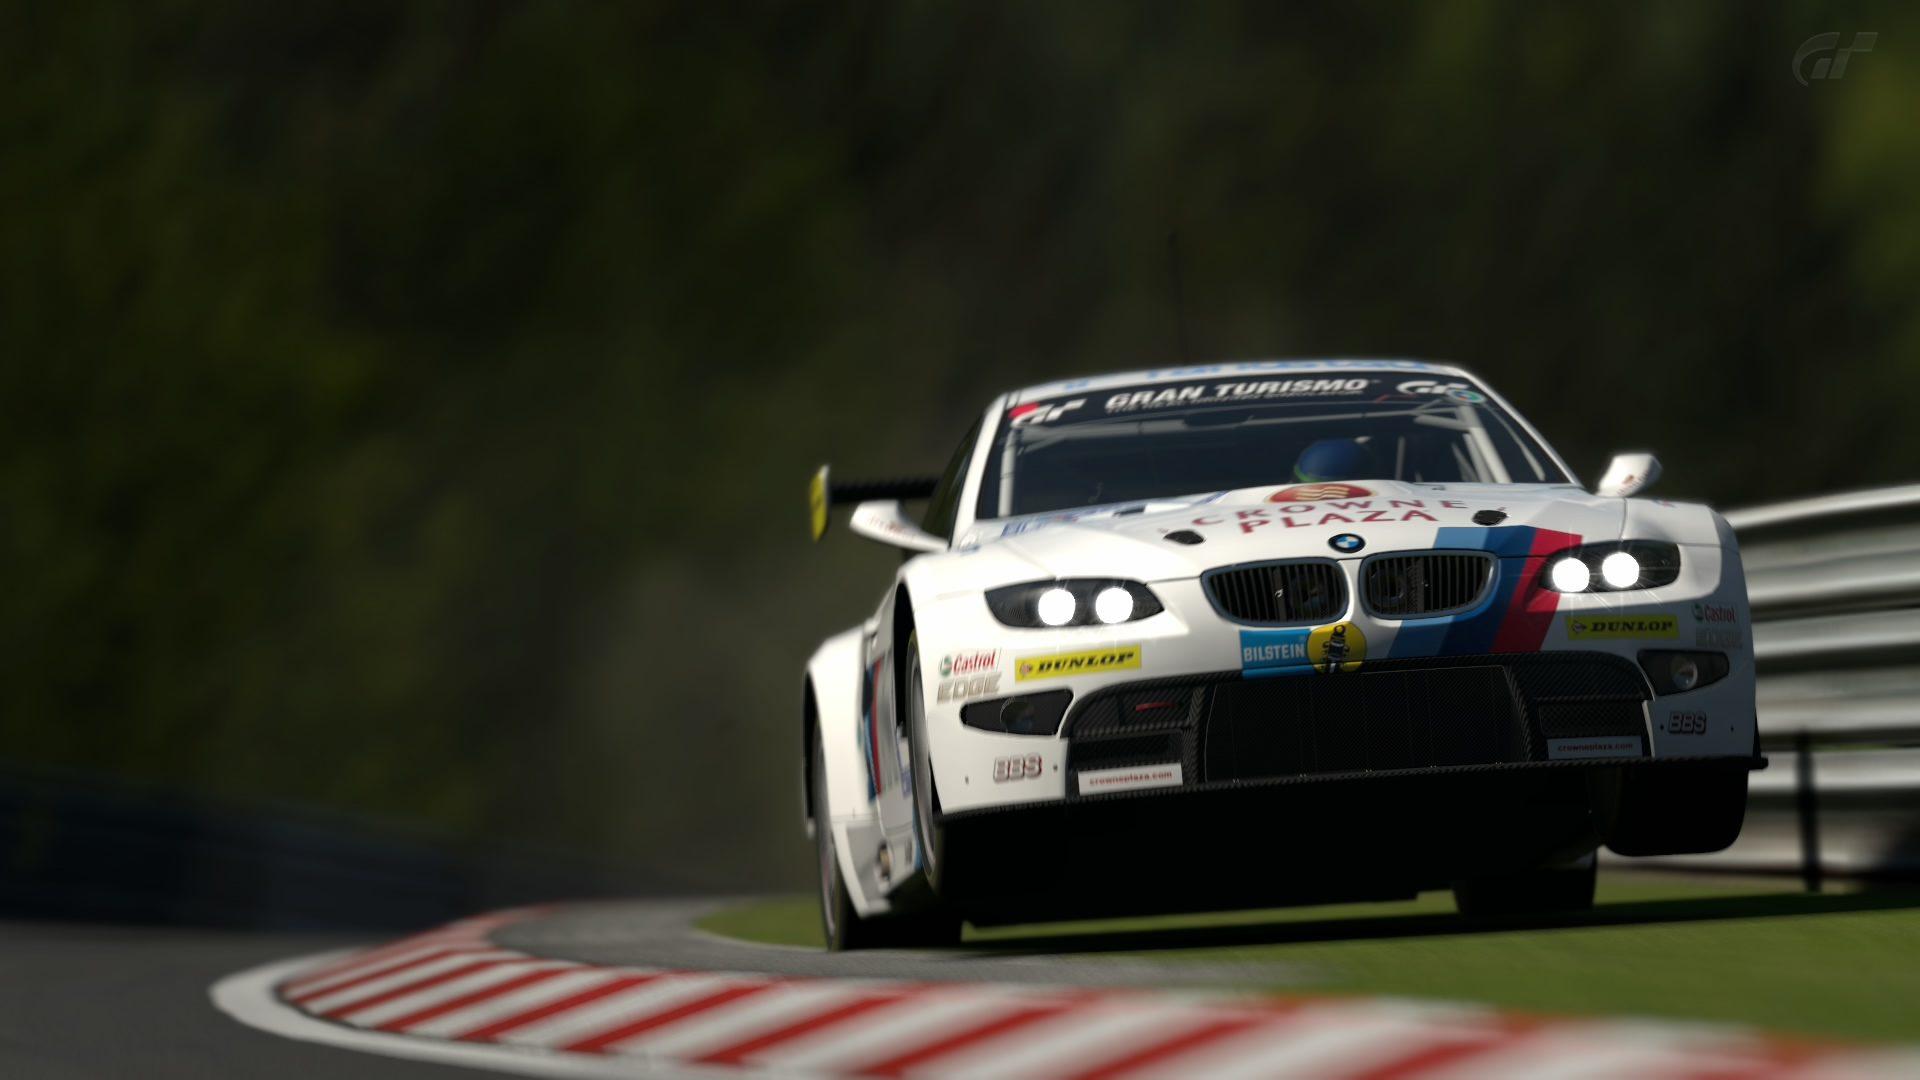 Nürburgring Nordschleife_36.jpg